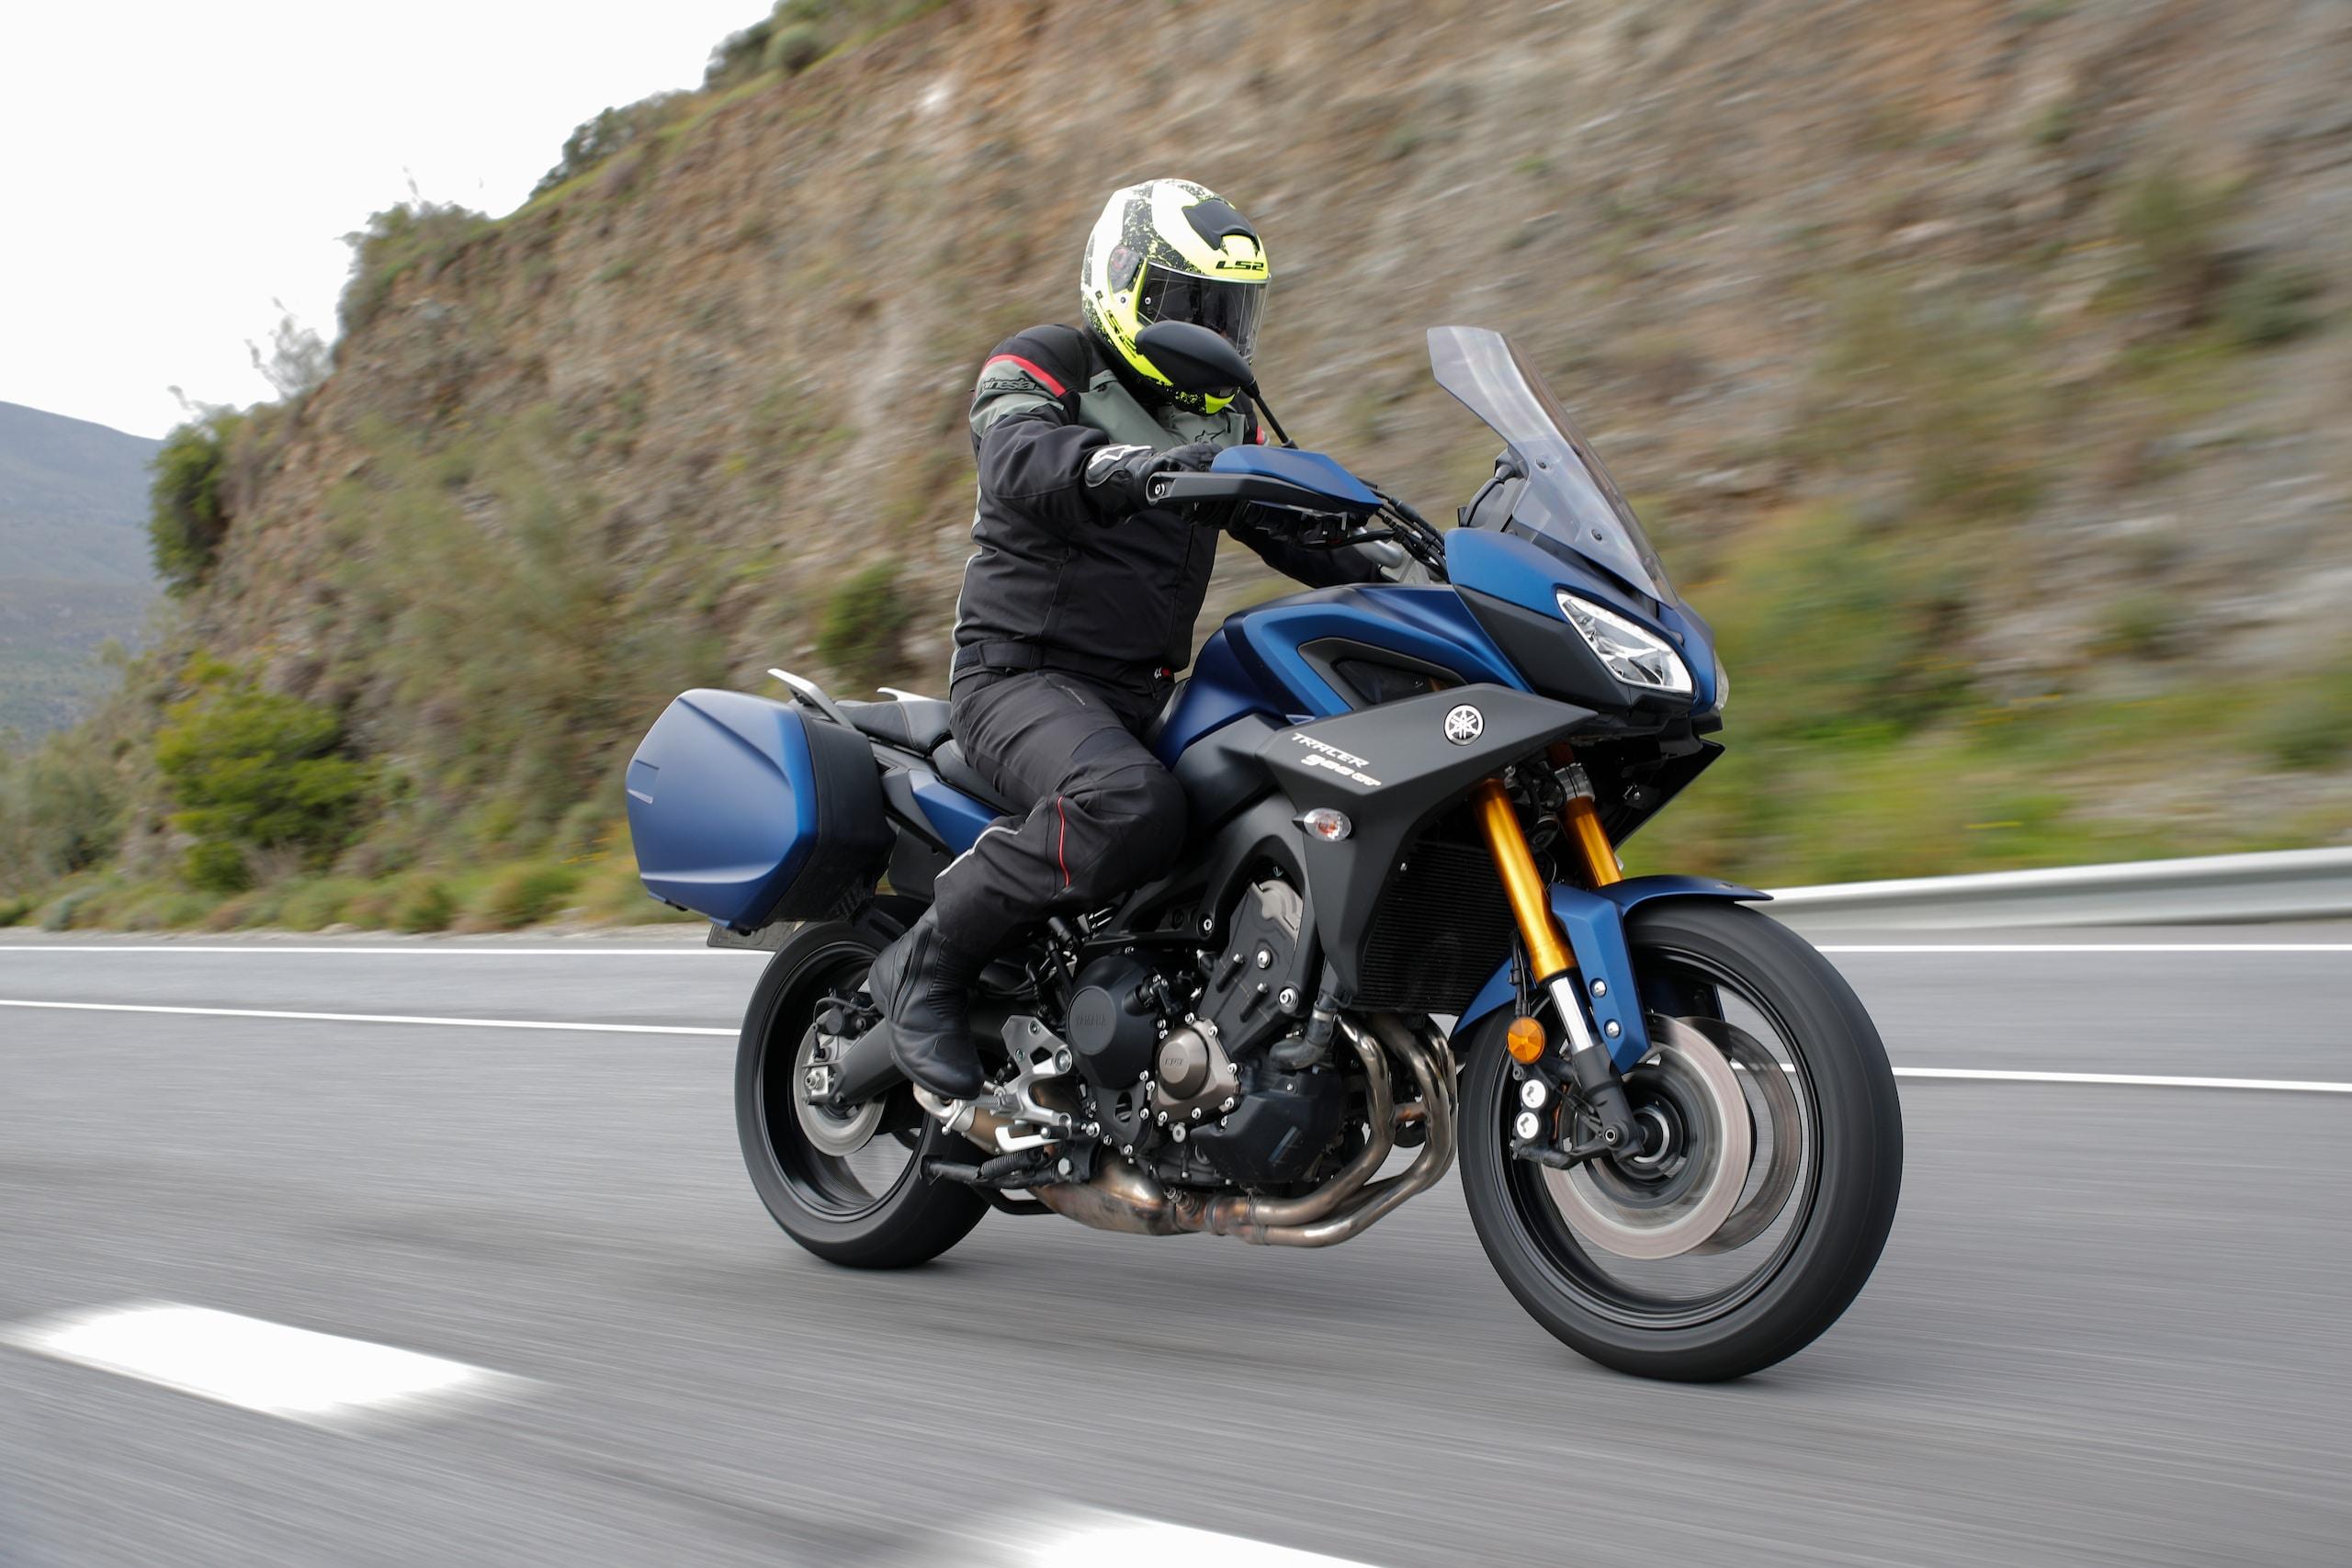 Yamaha Tracer 900 2018, compagna dalla doppia anima